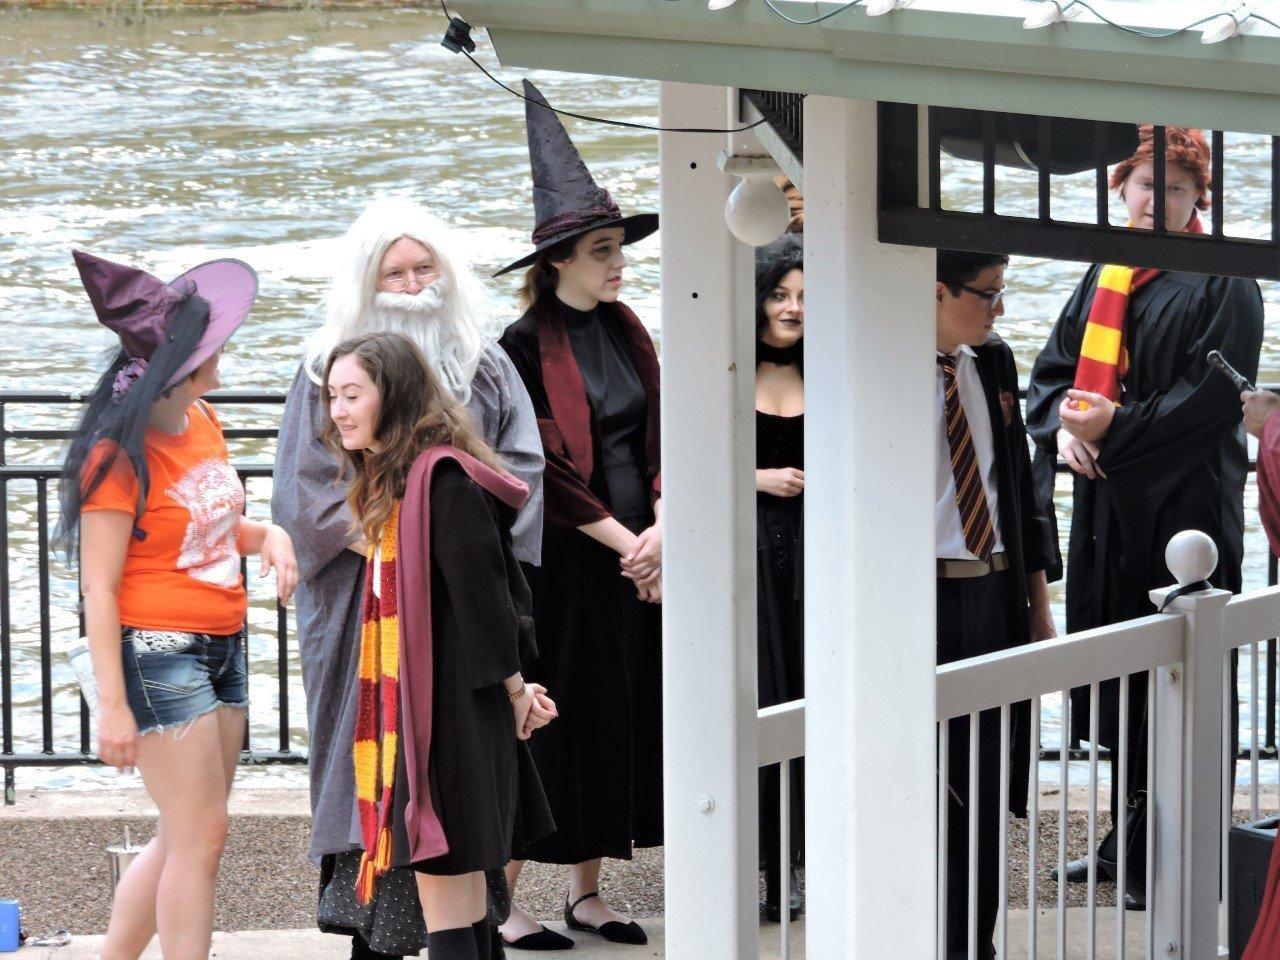 Warner Bros Crackdown Puts Dark Mark Over Harry Potter Festivals